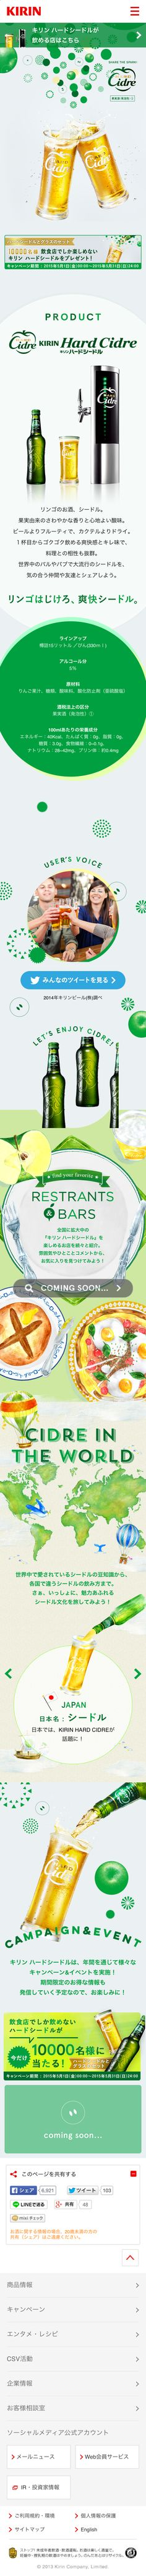 http://www.kirin.co.jp/products/rtd/hardcidre/sp/